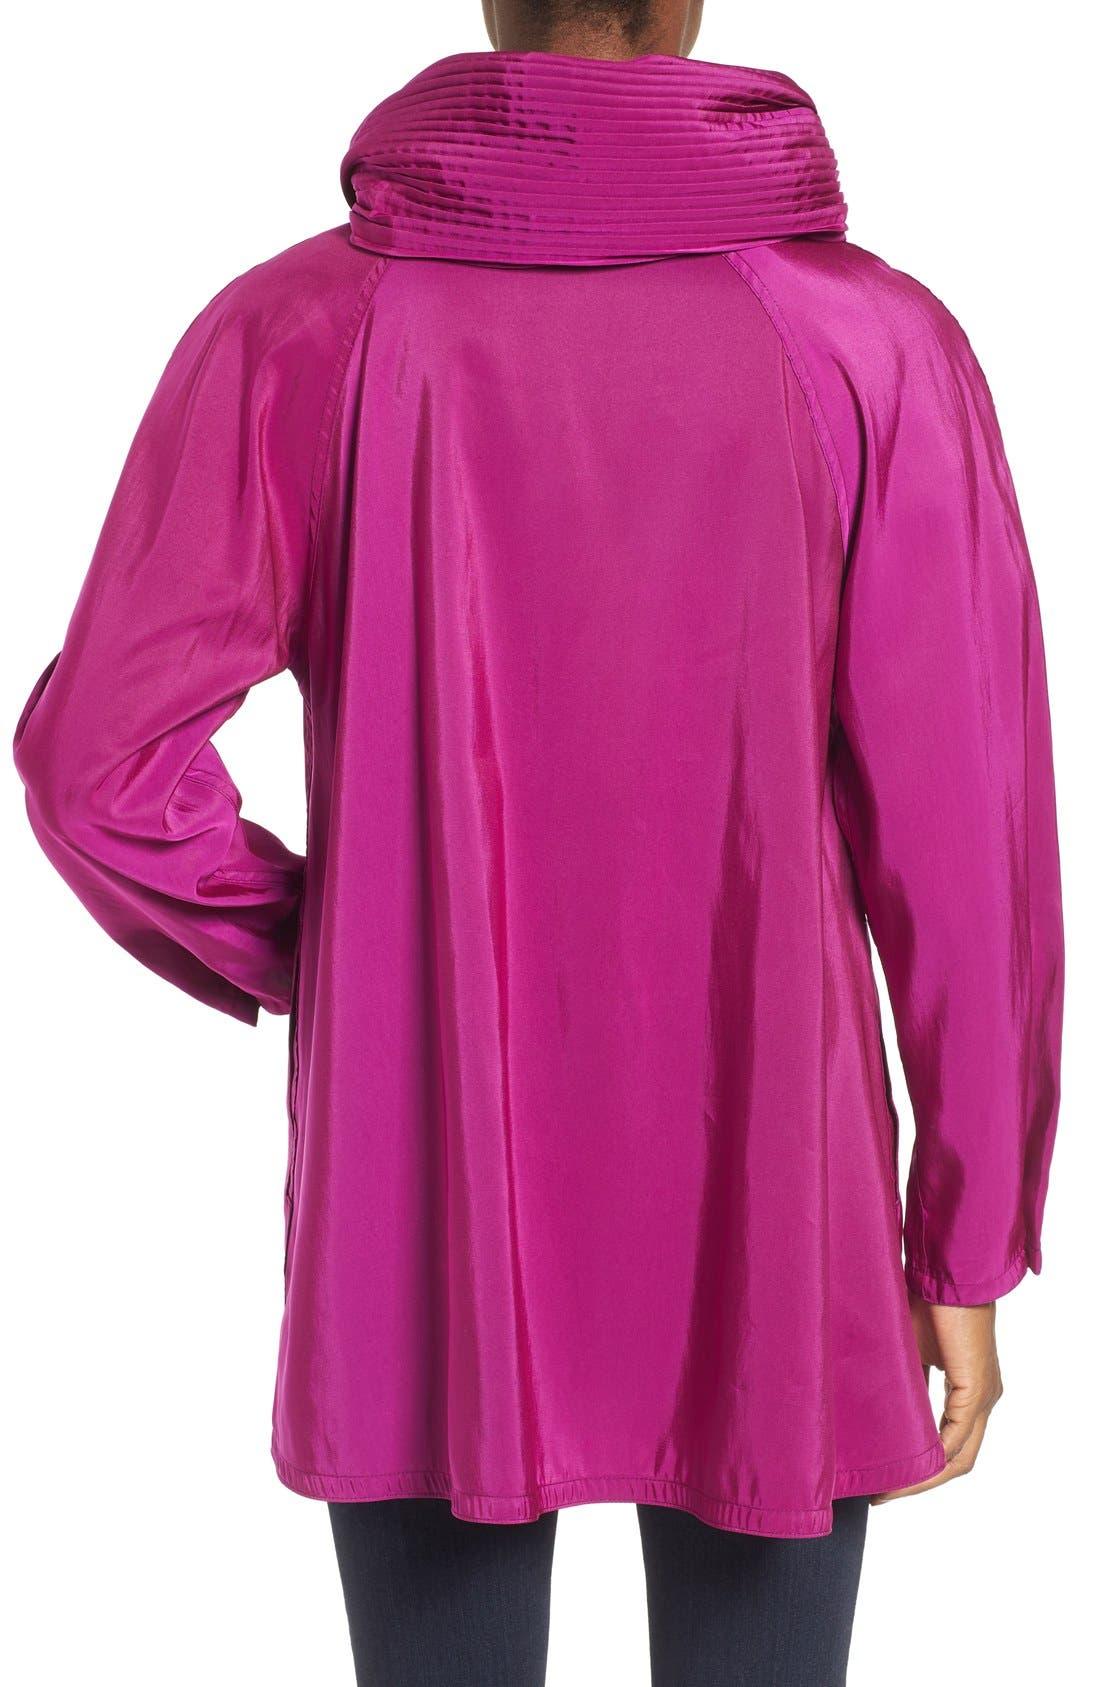 'Mini Donatella' Reversible Pleat Hood Packable Travel Coat,                             Alternate thumbnail 28, color,